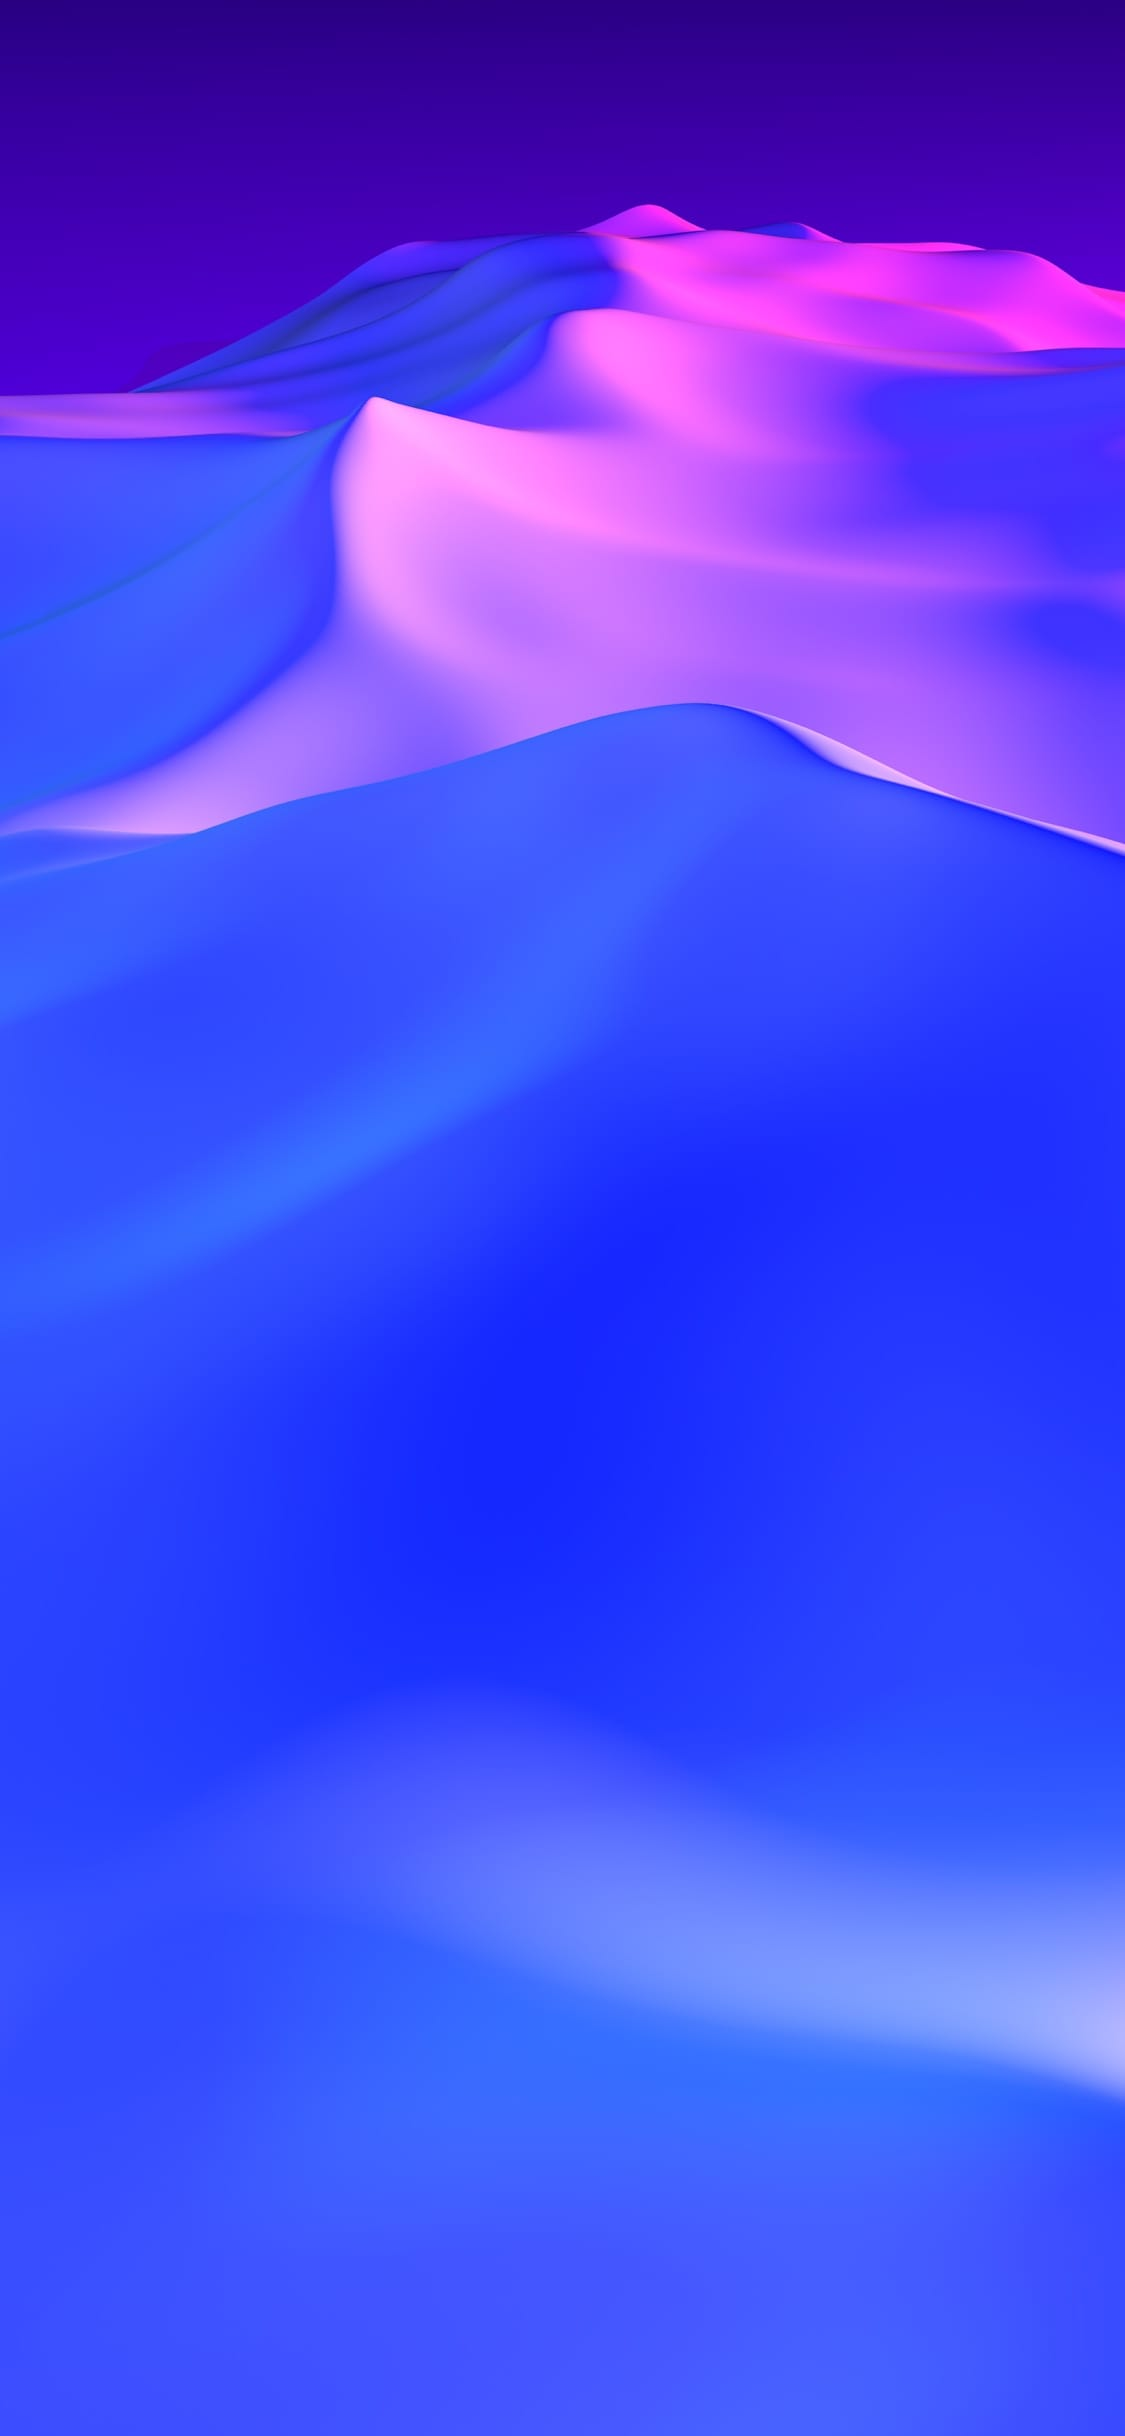 iPhone X Wallpapers, Iphone X Wallpaper, #28586